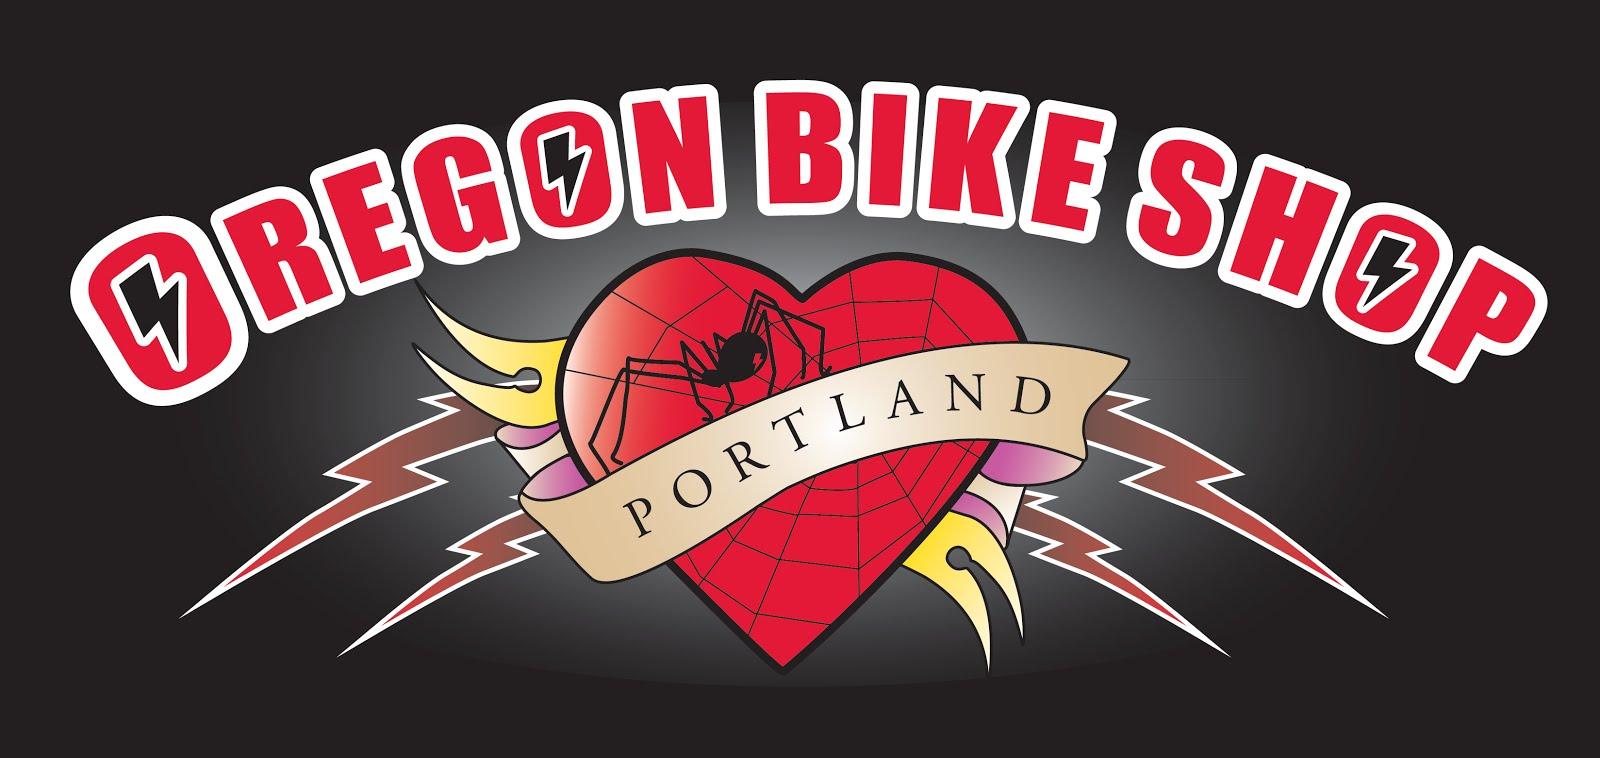 Oregon Bike Shop